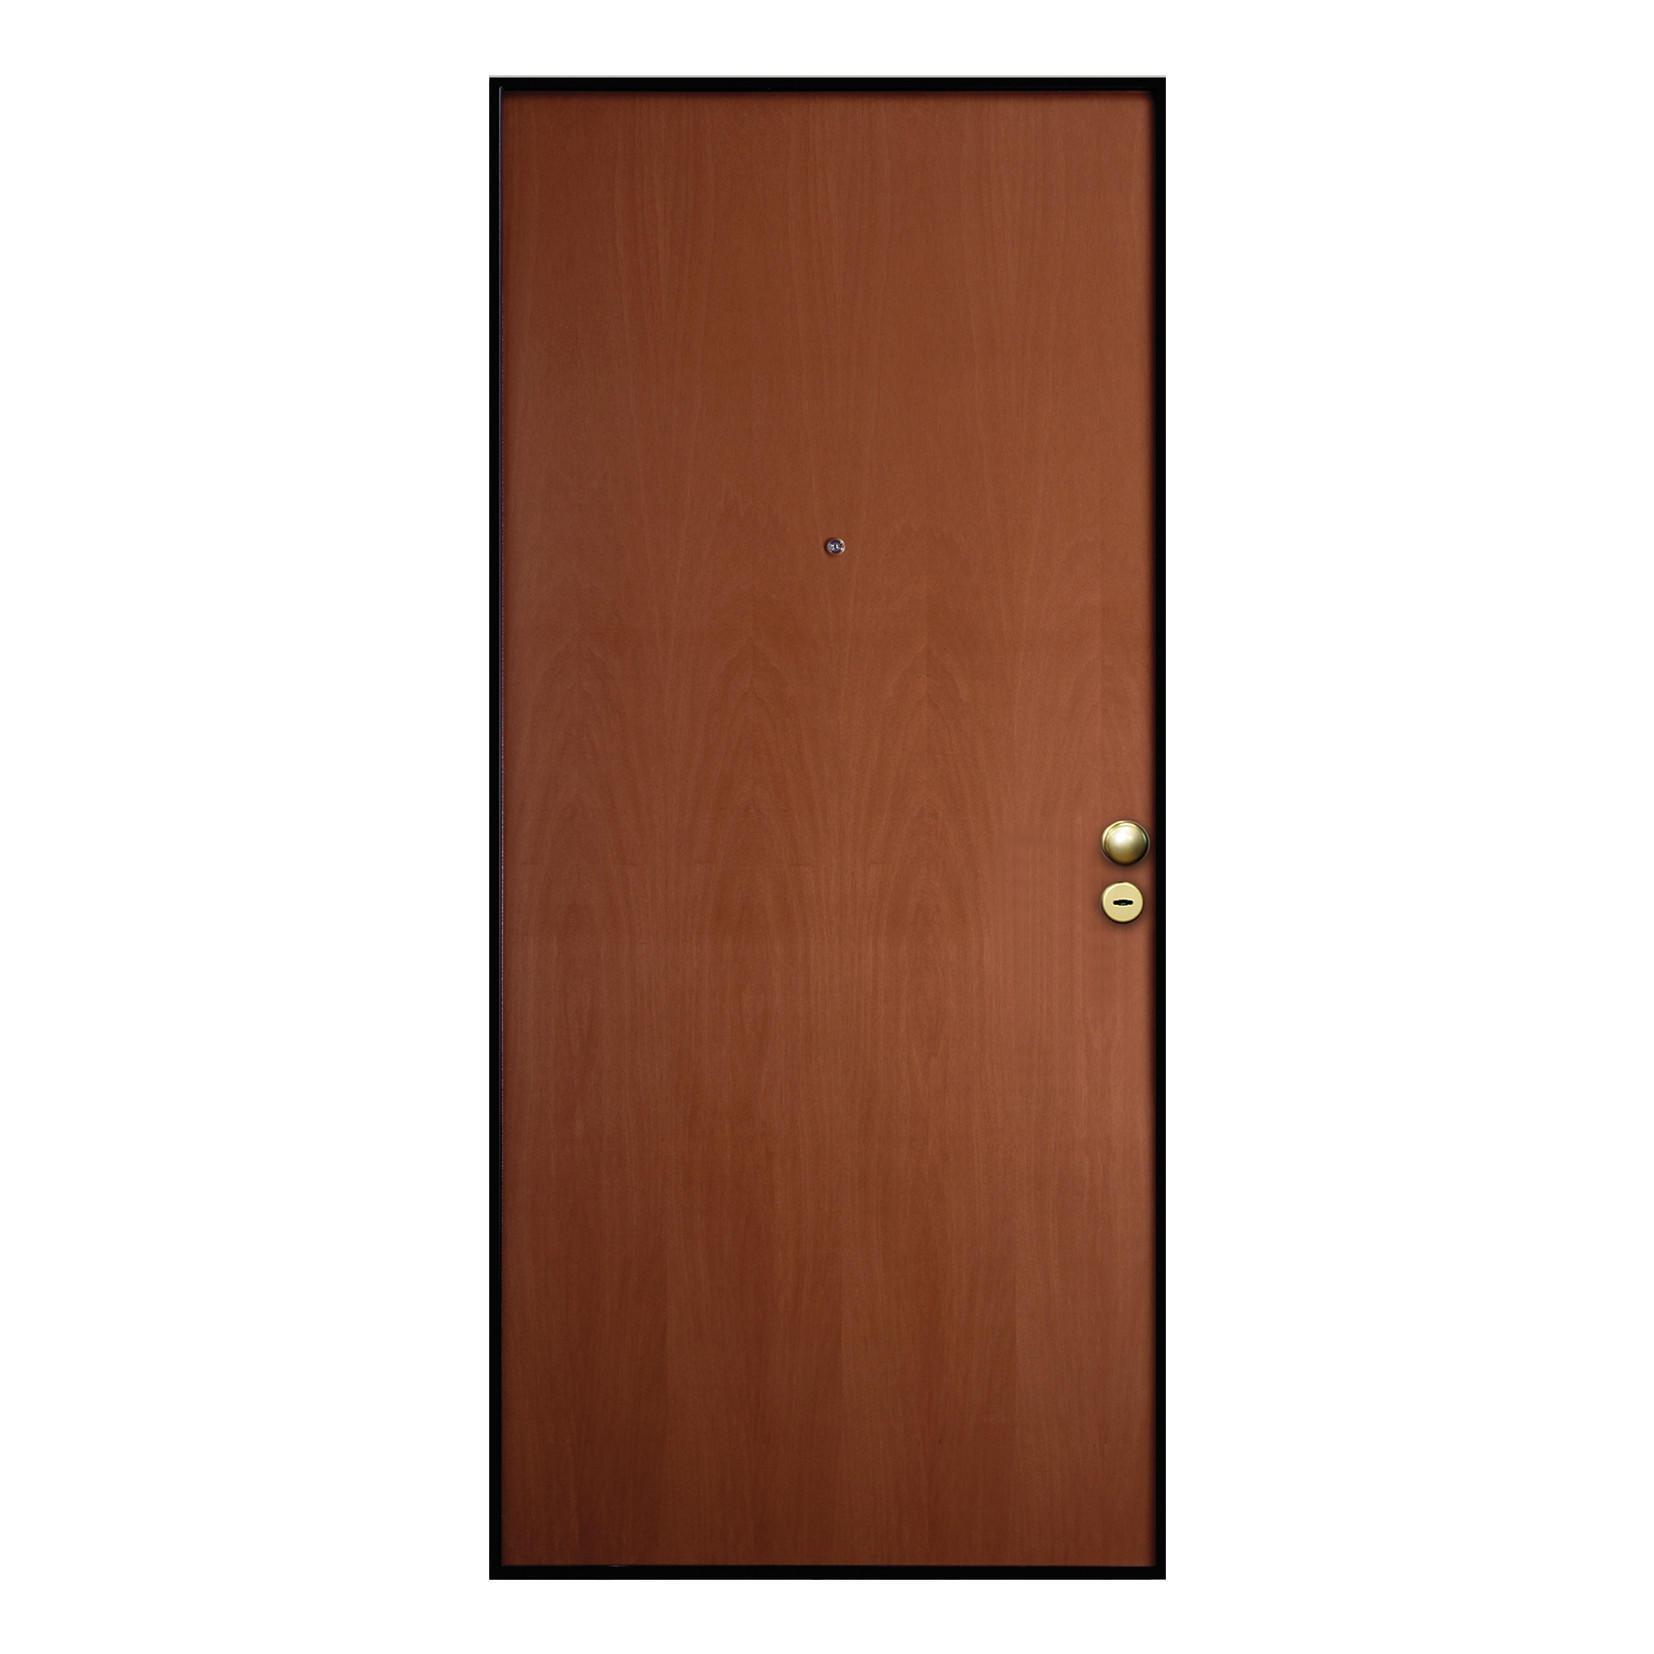 Porta blindata Good noce L 90 x H 210 cm sinistra - 3